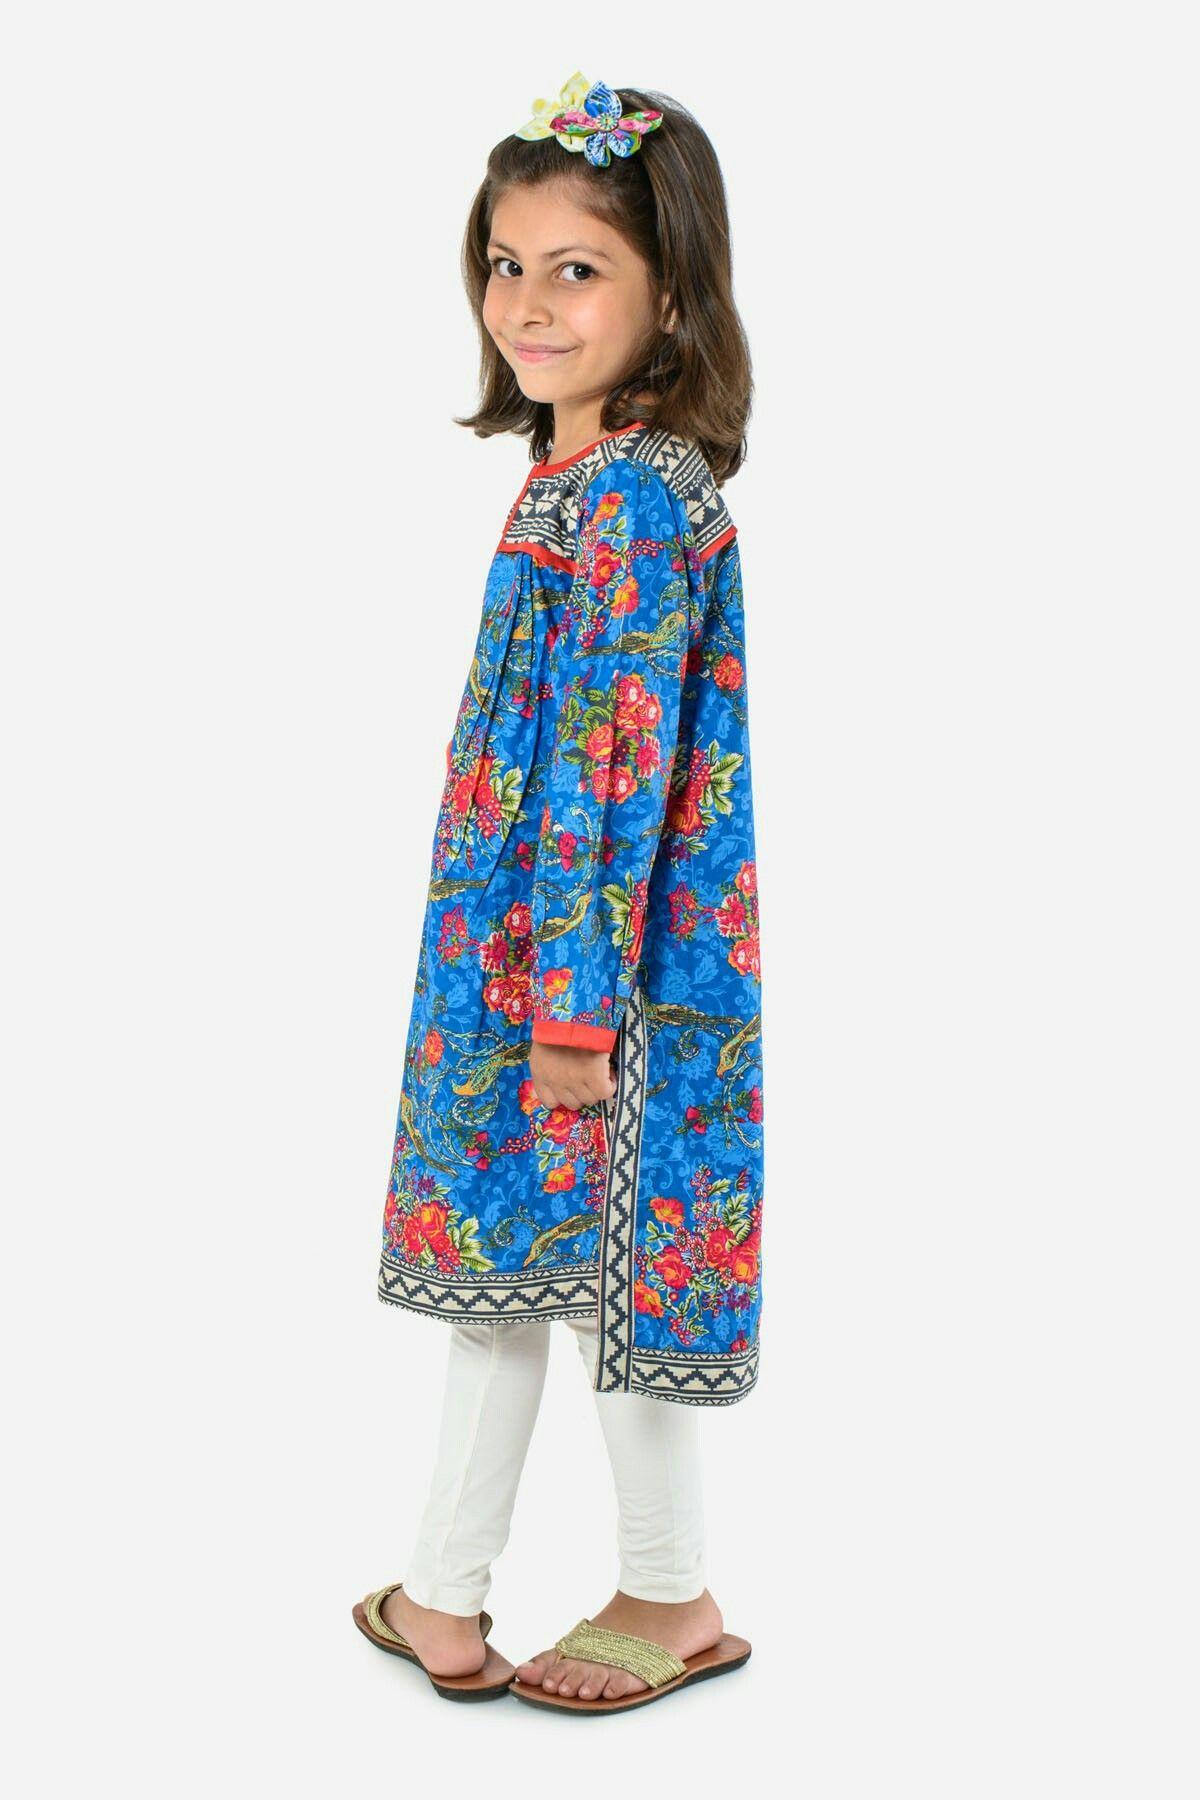 Khaadi kids pakistan | Cute girl dresses, Girl outfits ...